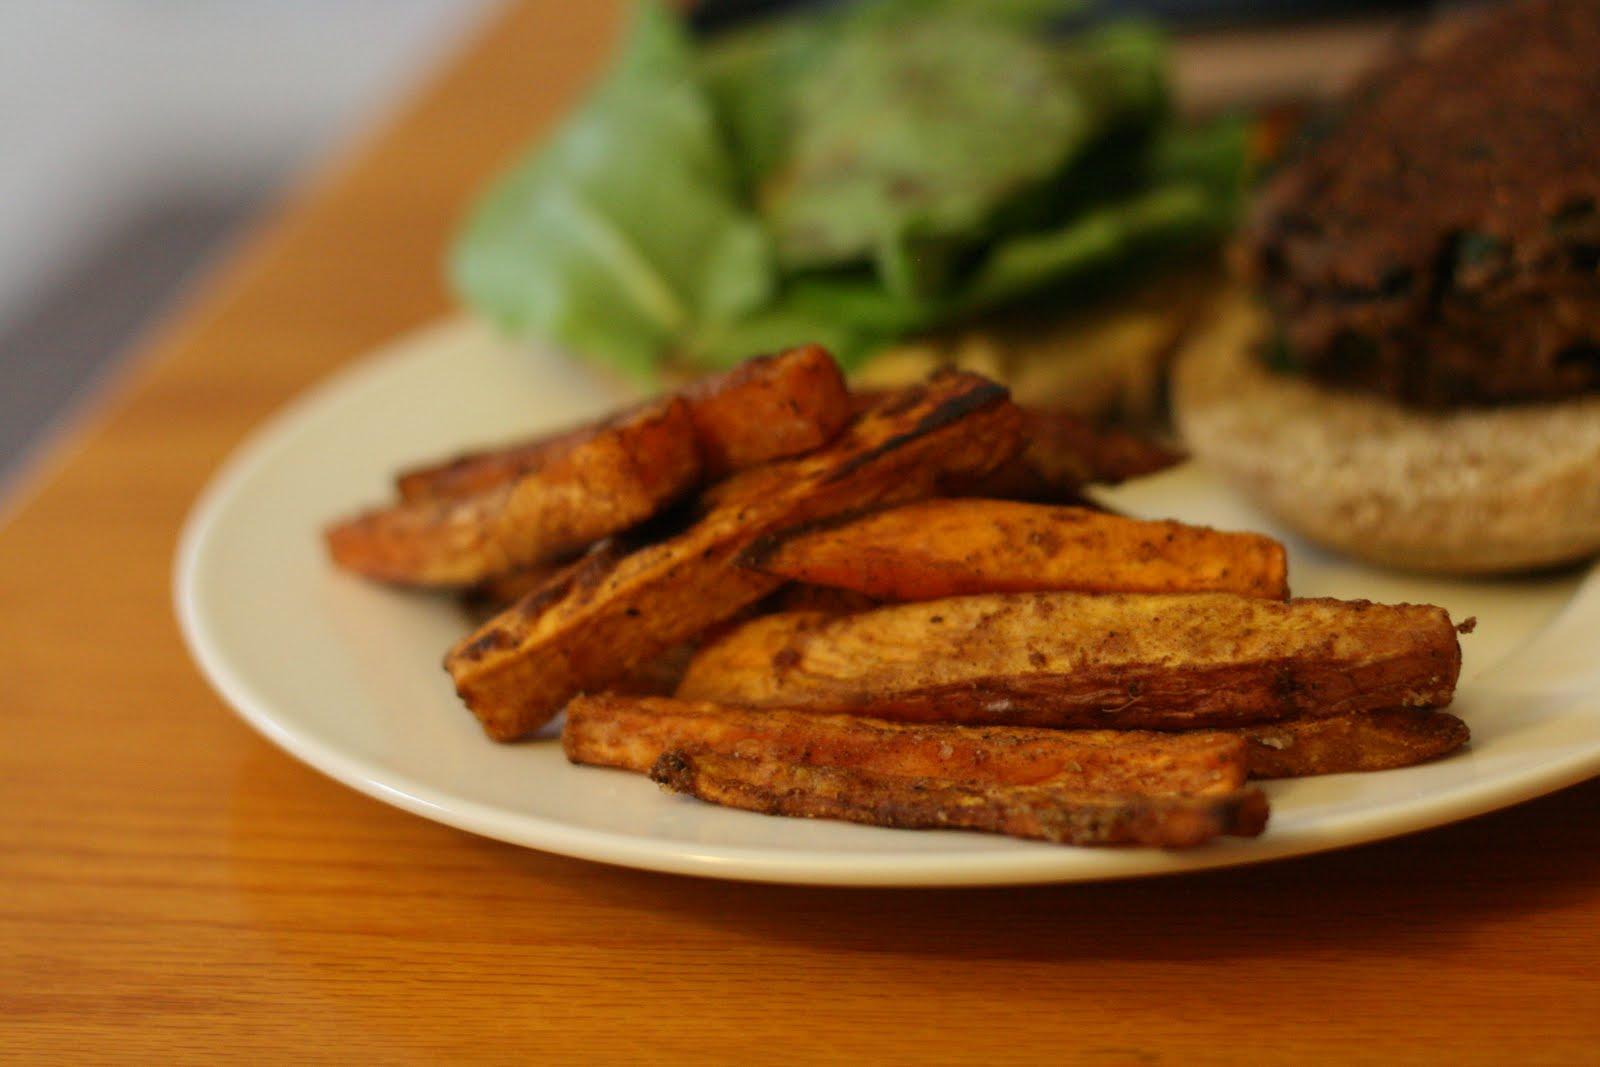 ... sweet potato fries recipe chili spiked sweet recipe chili spiked sweet